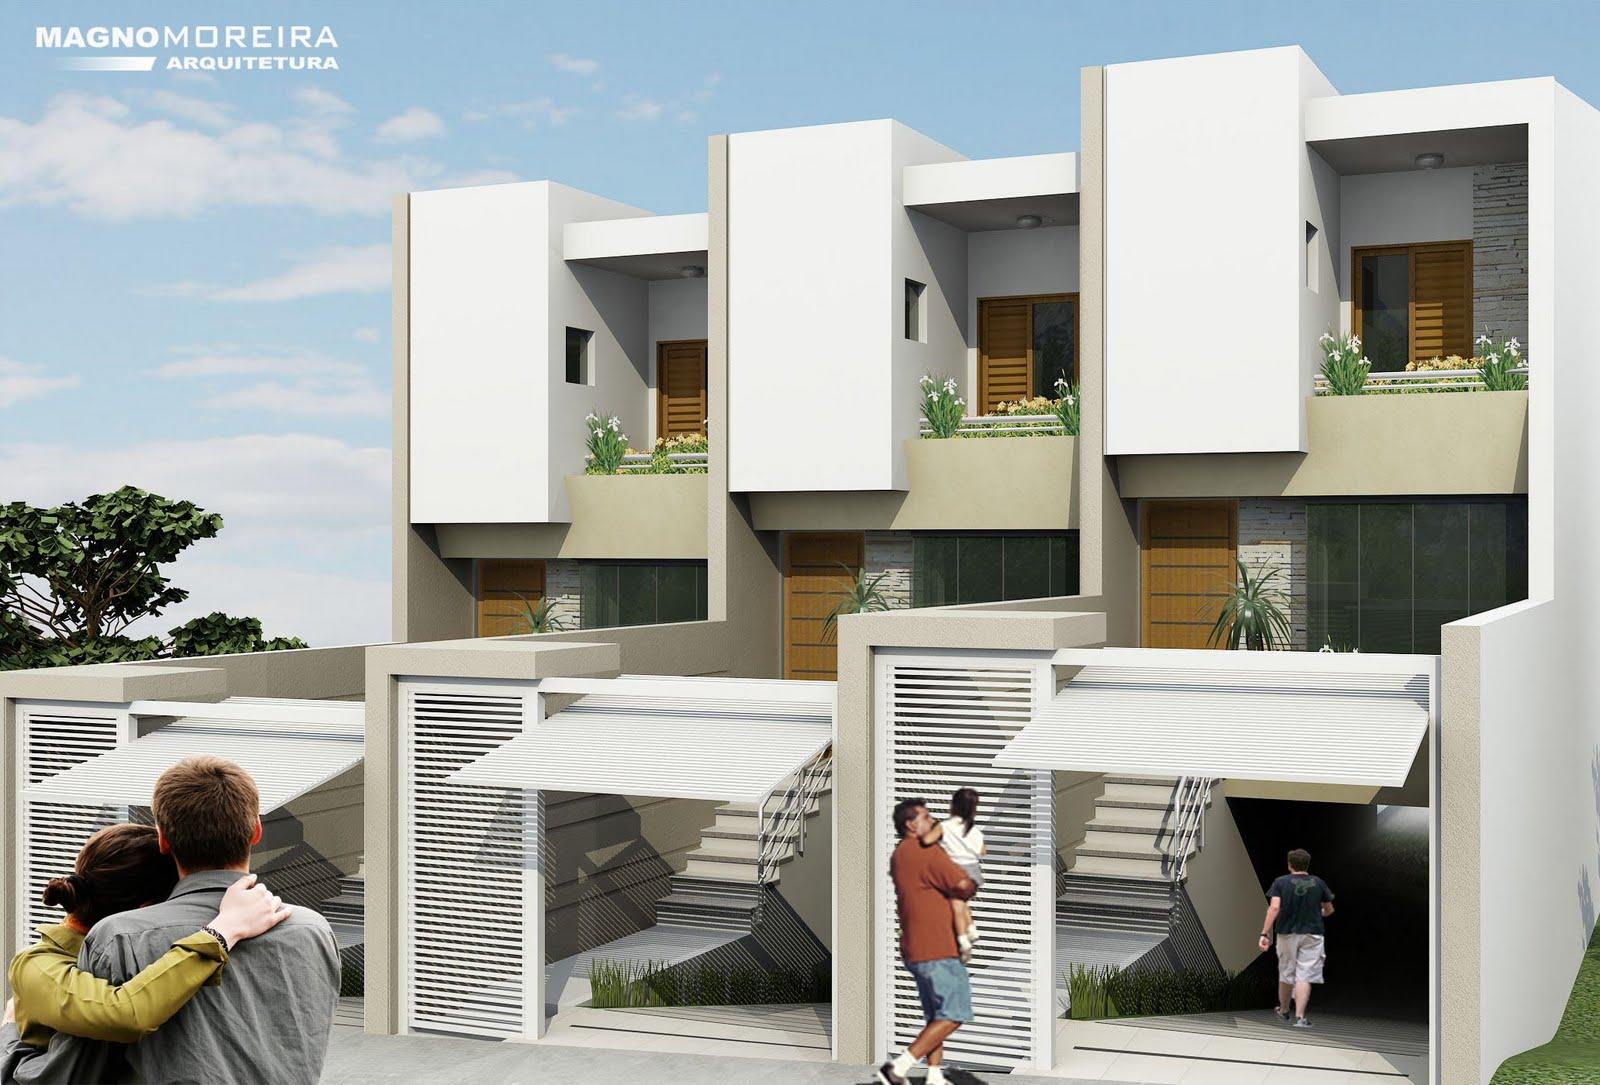 Plantas de Casas, Fachada, Arquiteto, Projetos de Casas